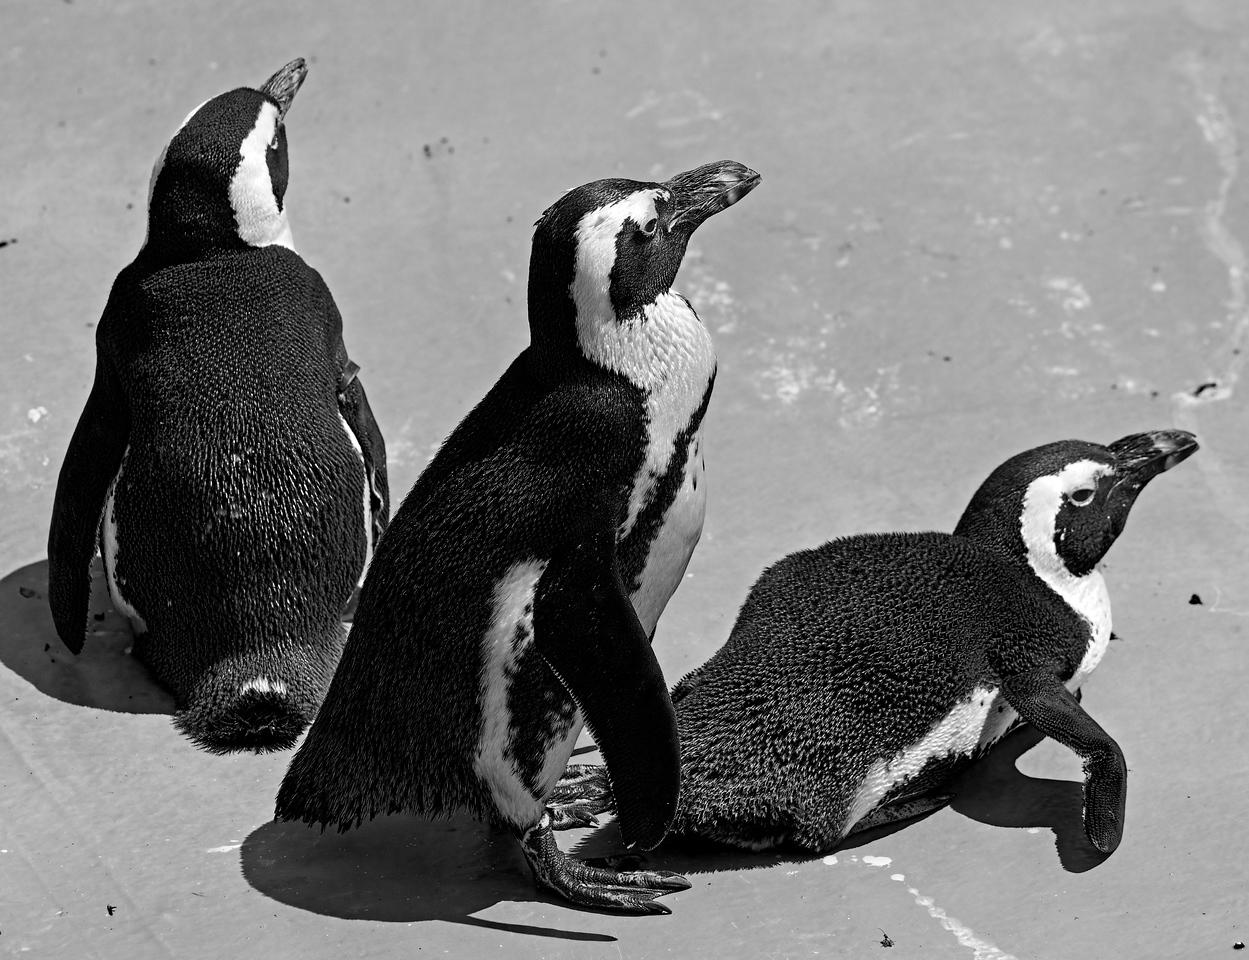 2011-06-02 - Toronto Zoo - 009